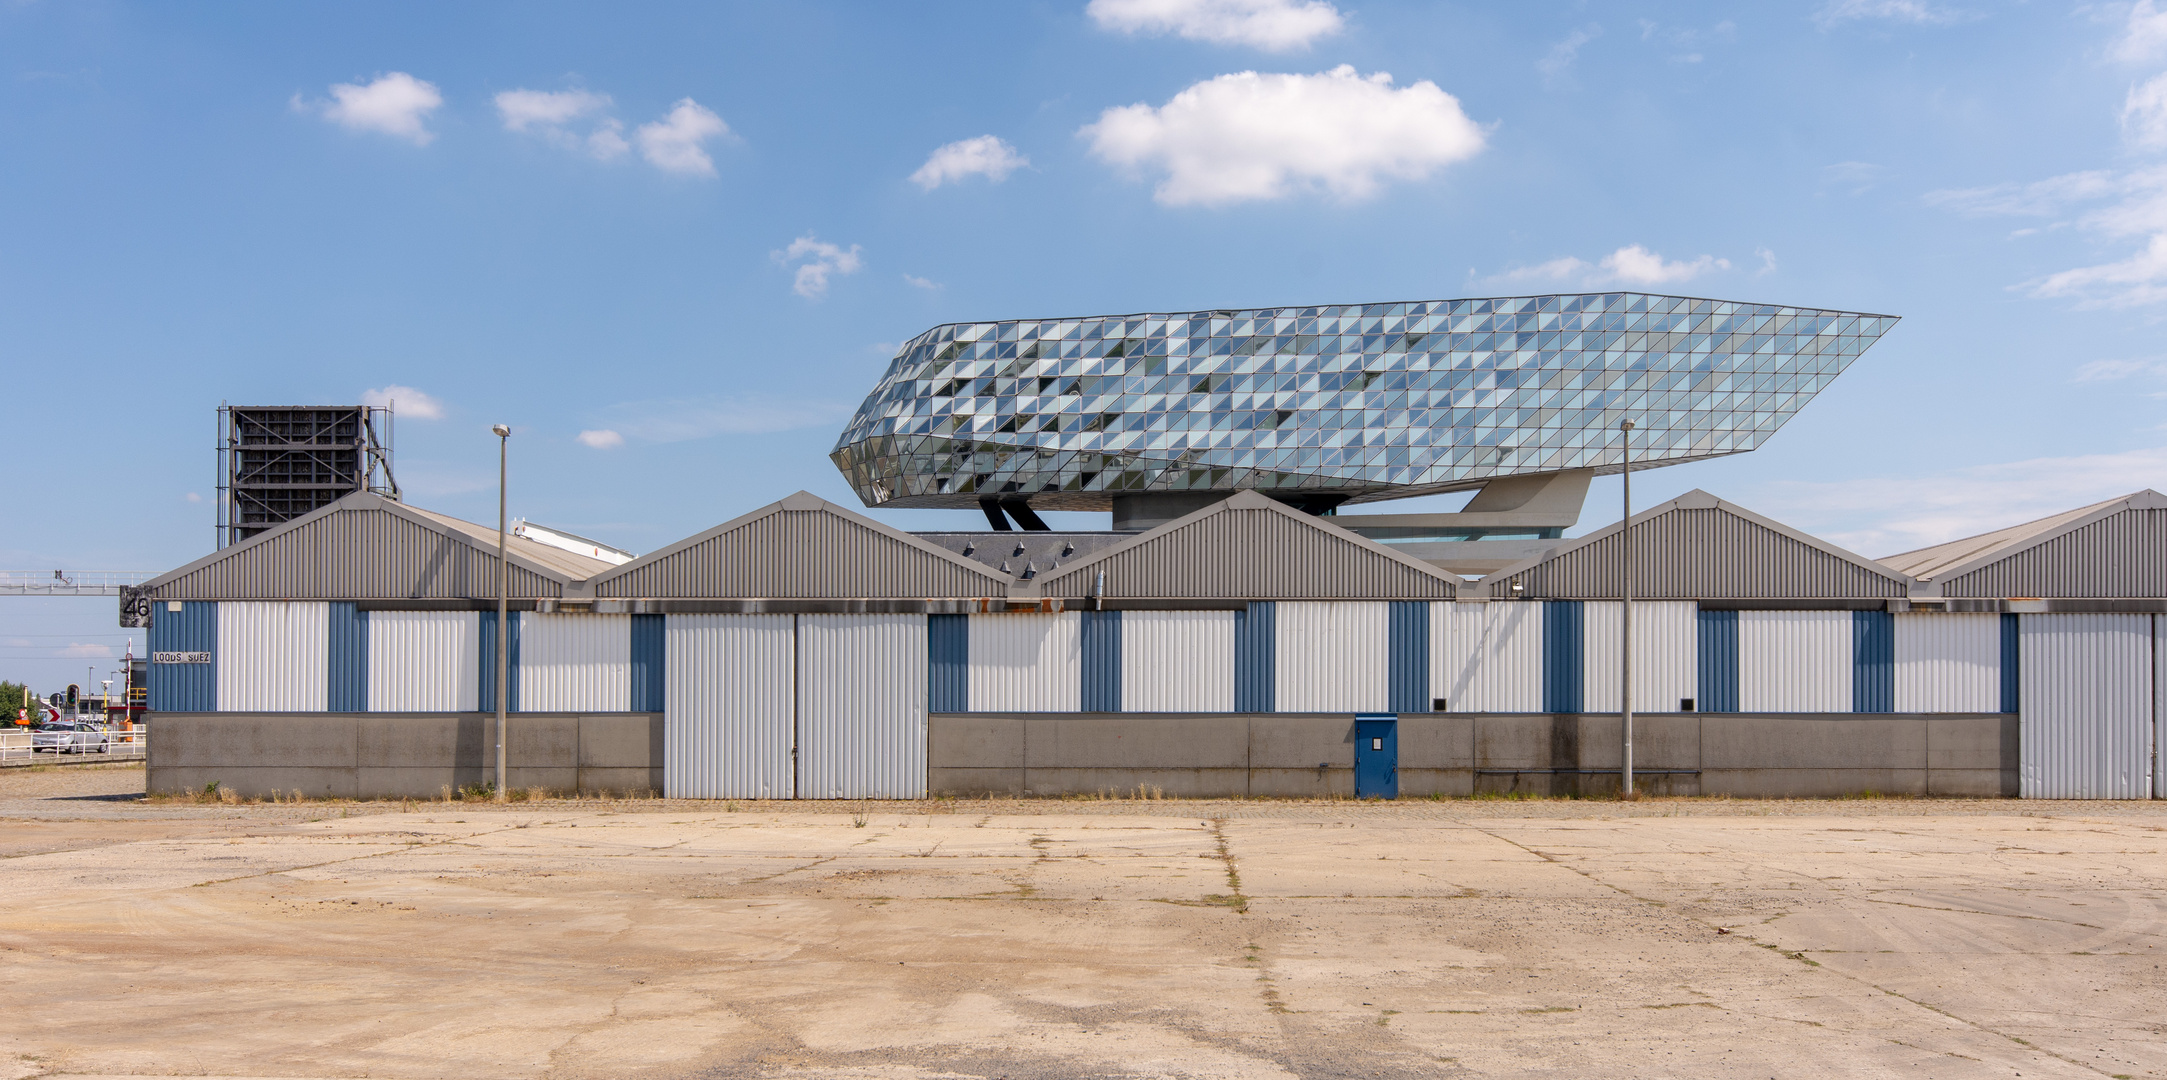 Eilandje - Siberiabrug - Port Authority Building - 04